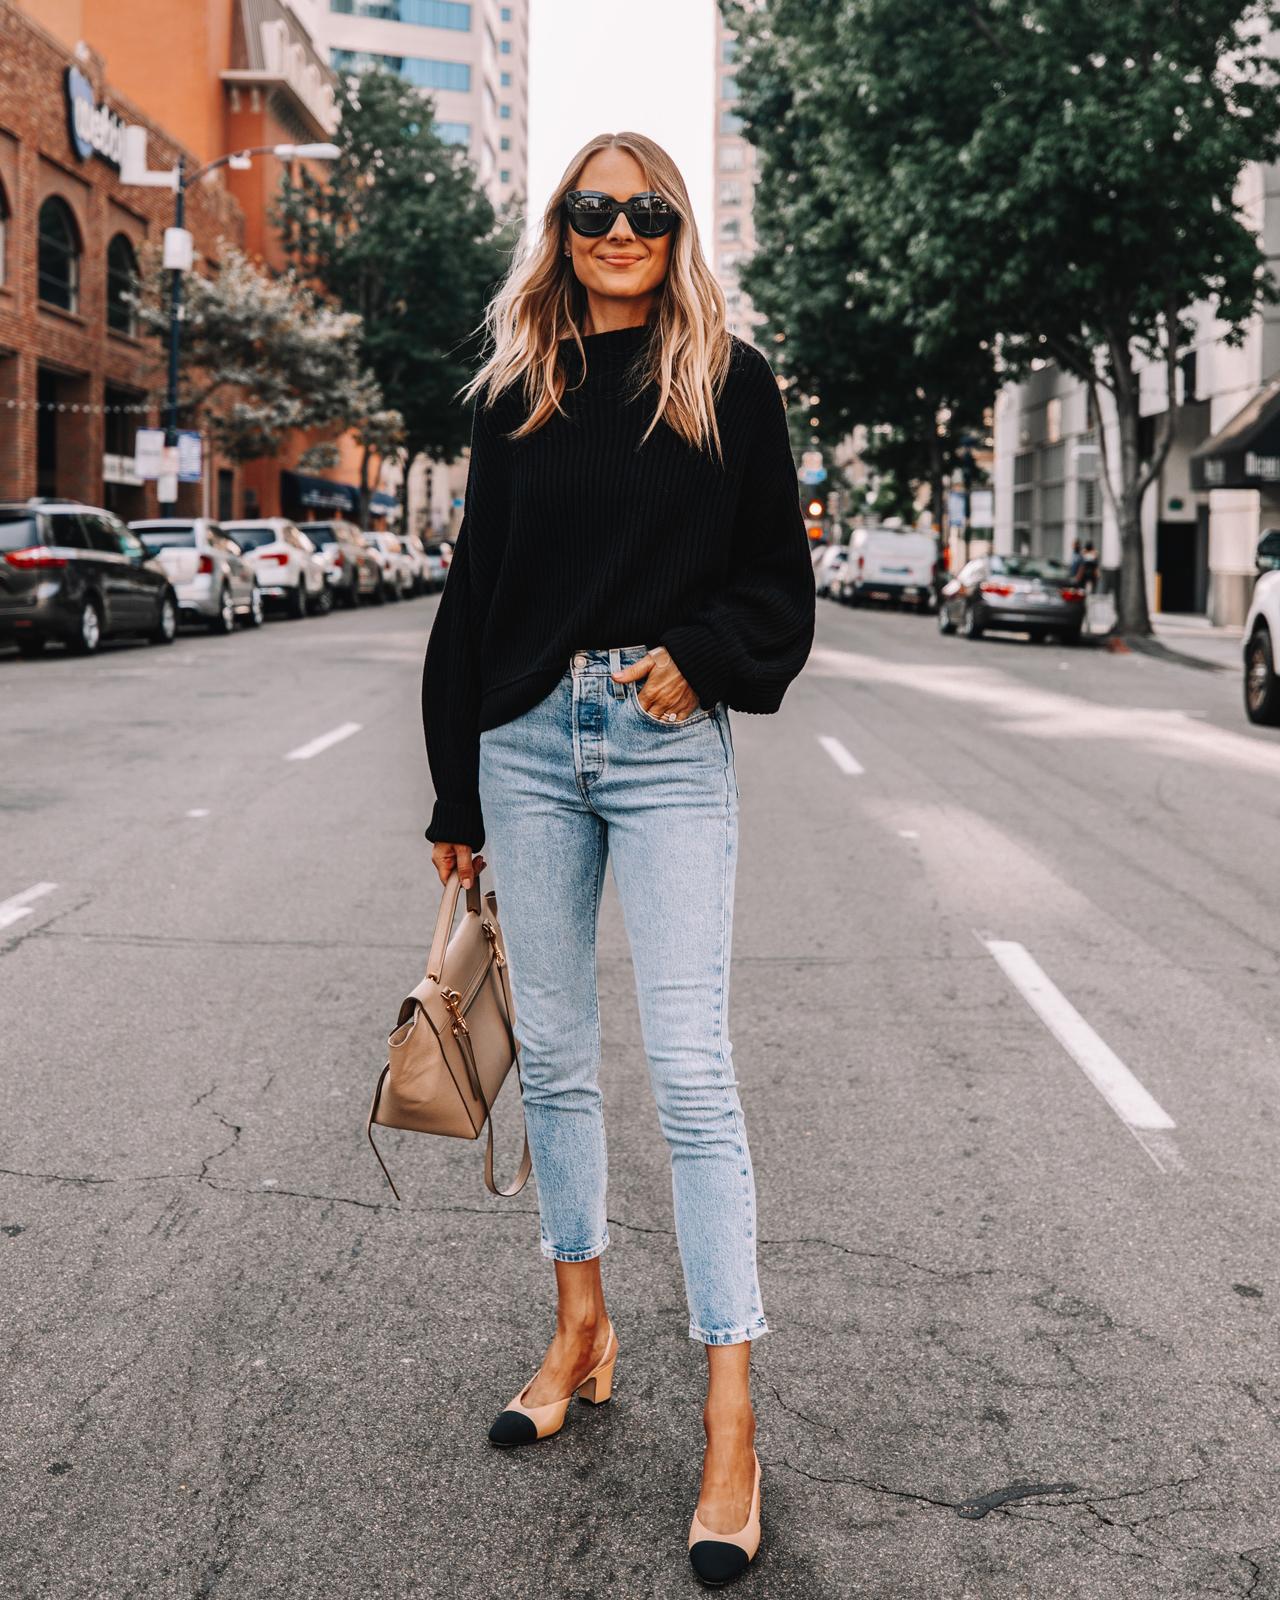 Fashion Jackson Wearing Free People Black Sweater Levis Skinny Jeans Chanel Slingbacks